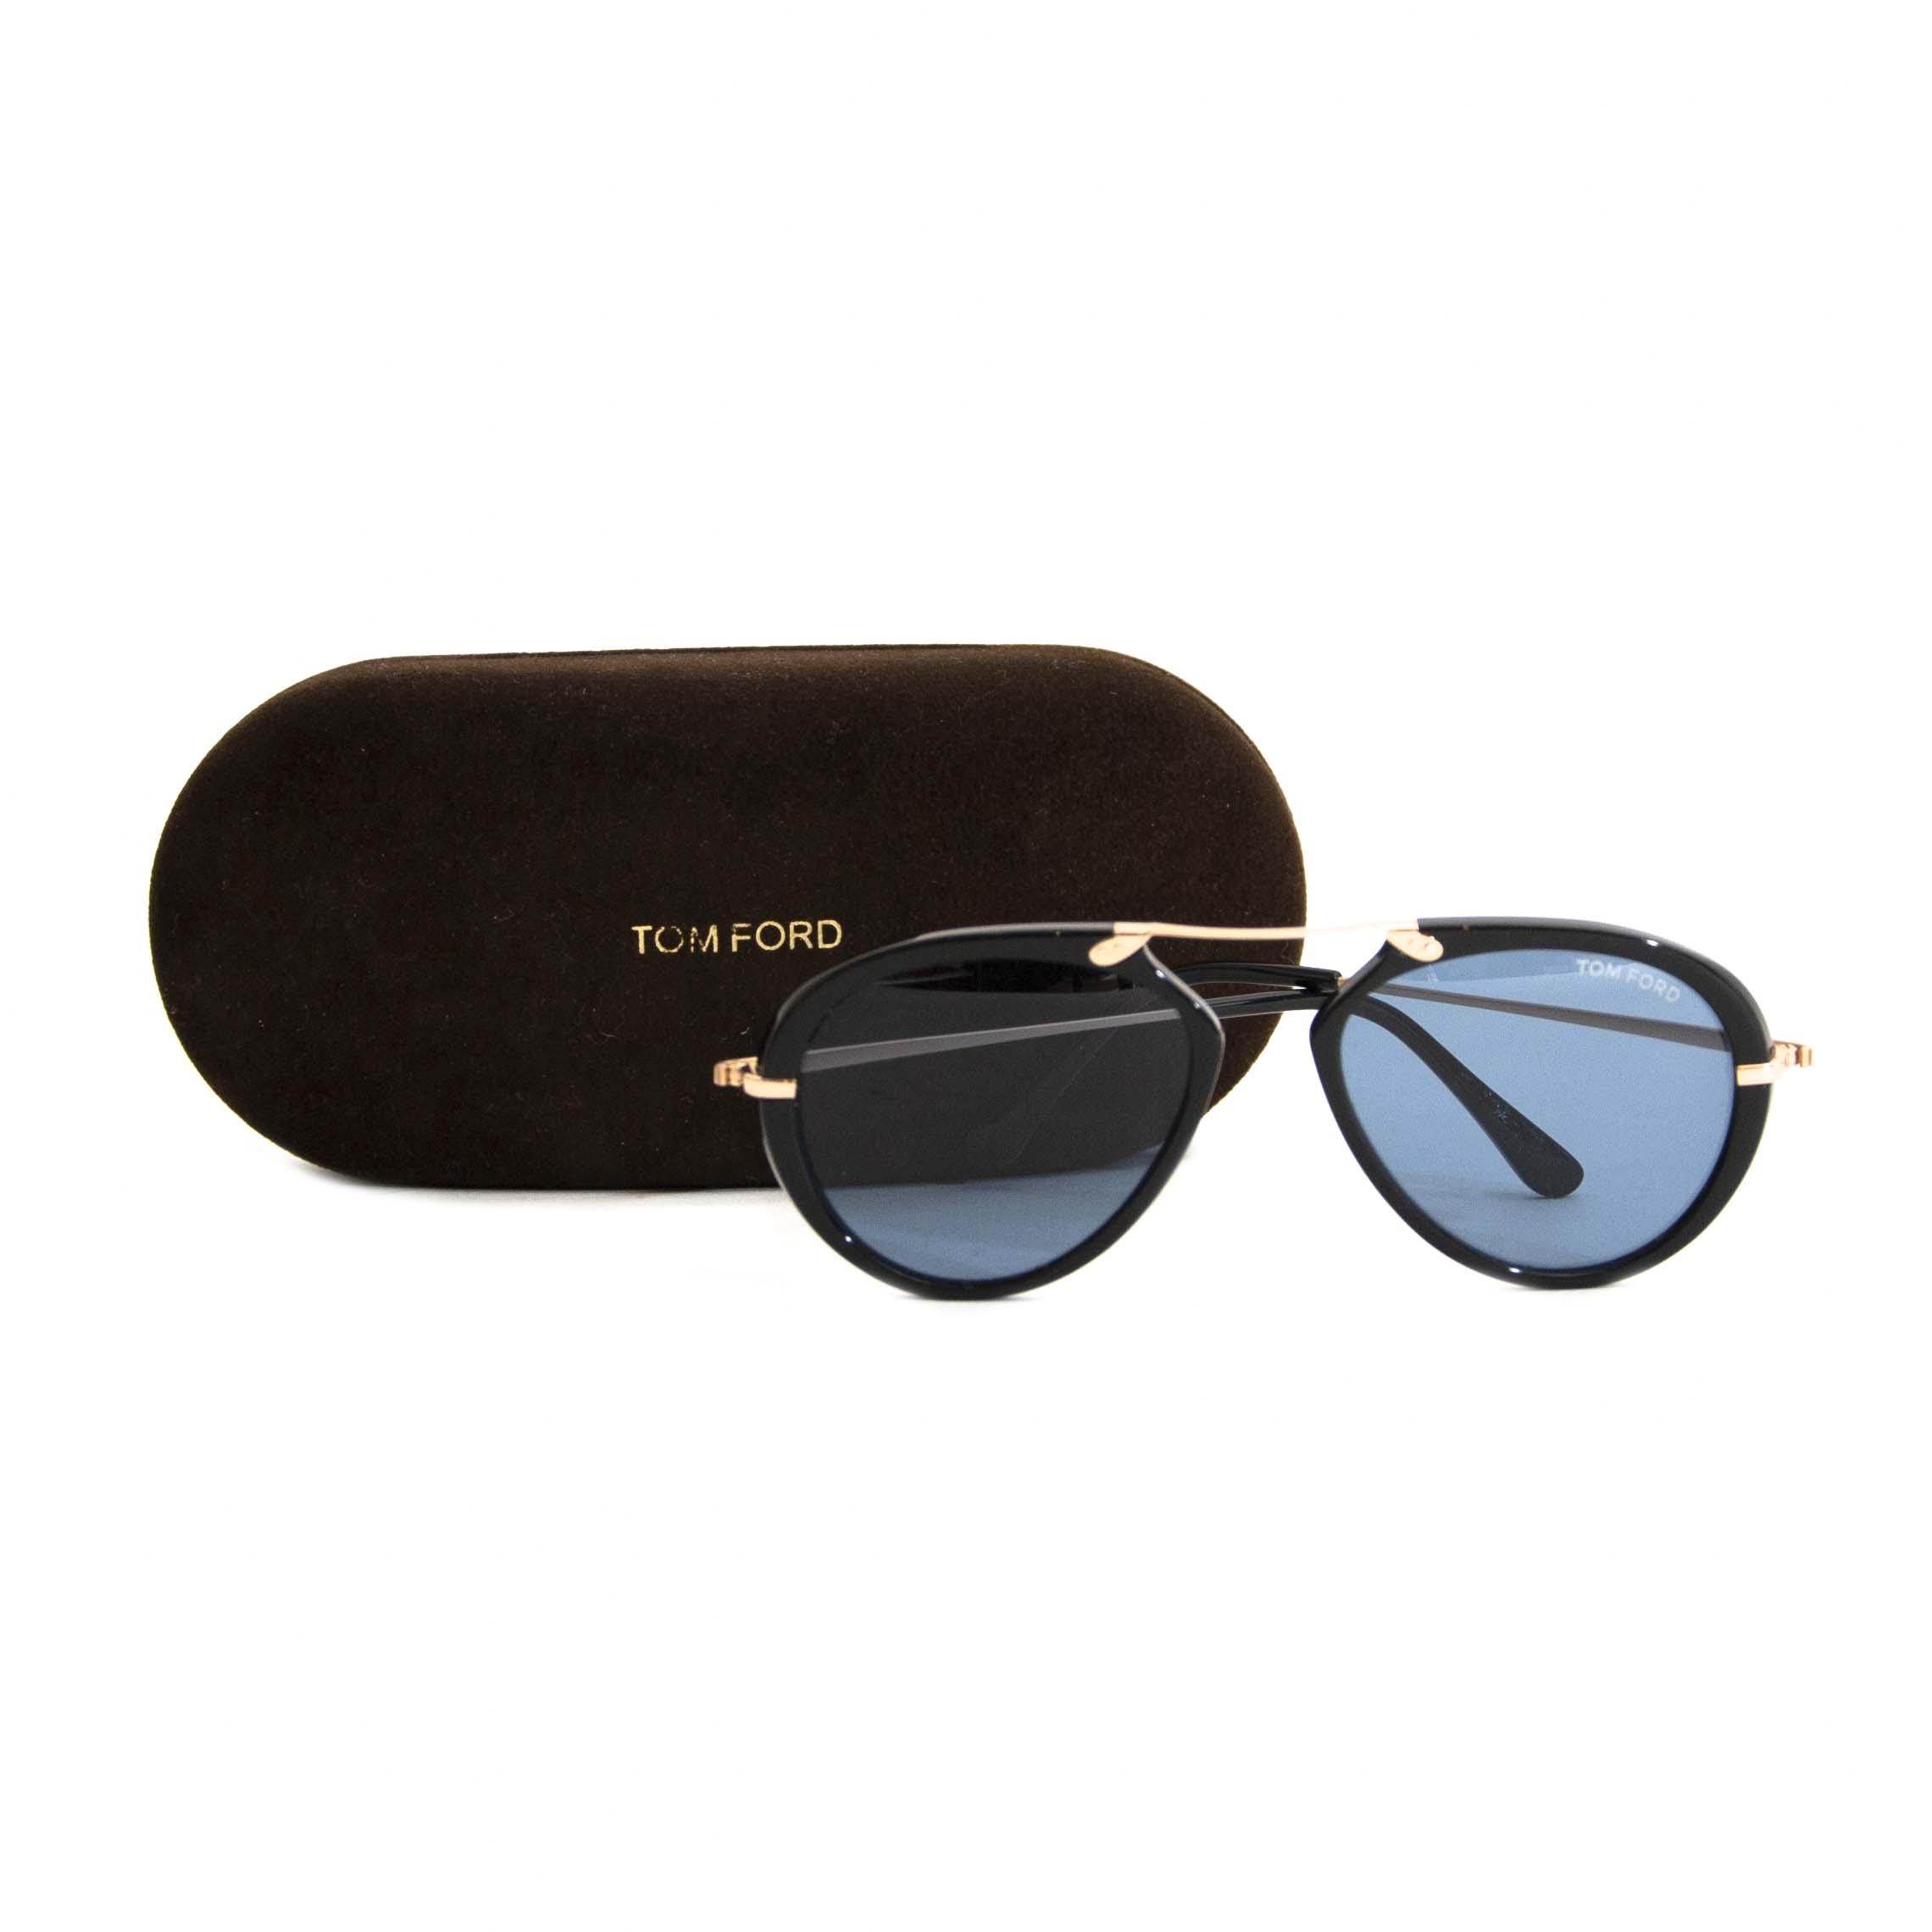 Tom Ford Black Tom N.11 Sunglasses